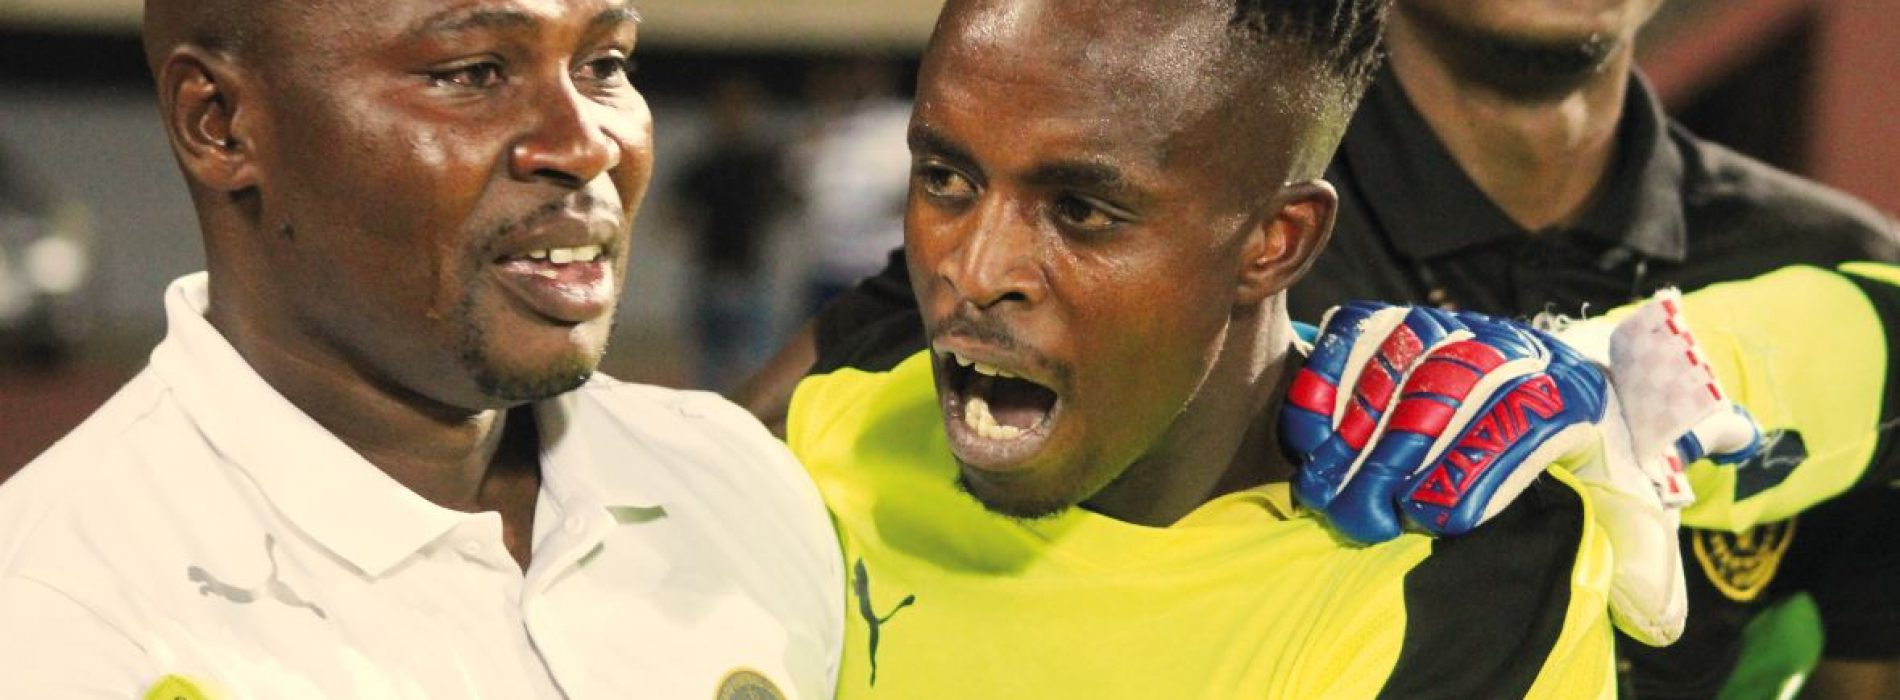 Tears of joy for Bantu keepers' coach